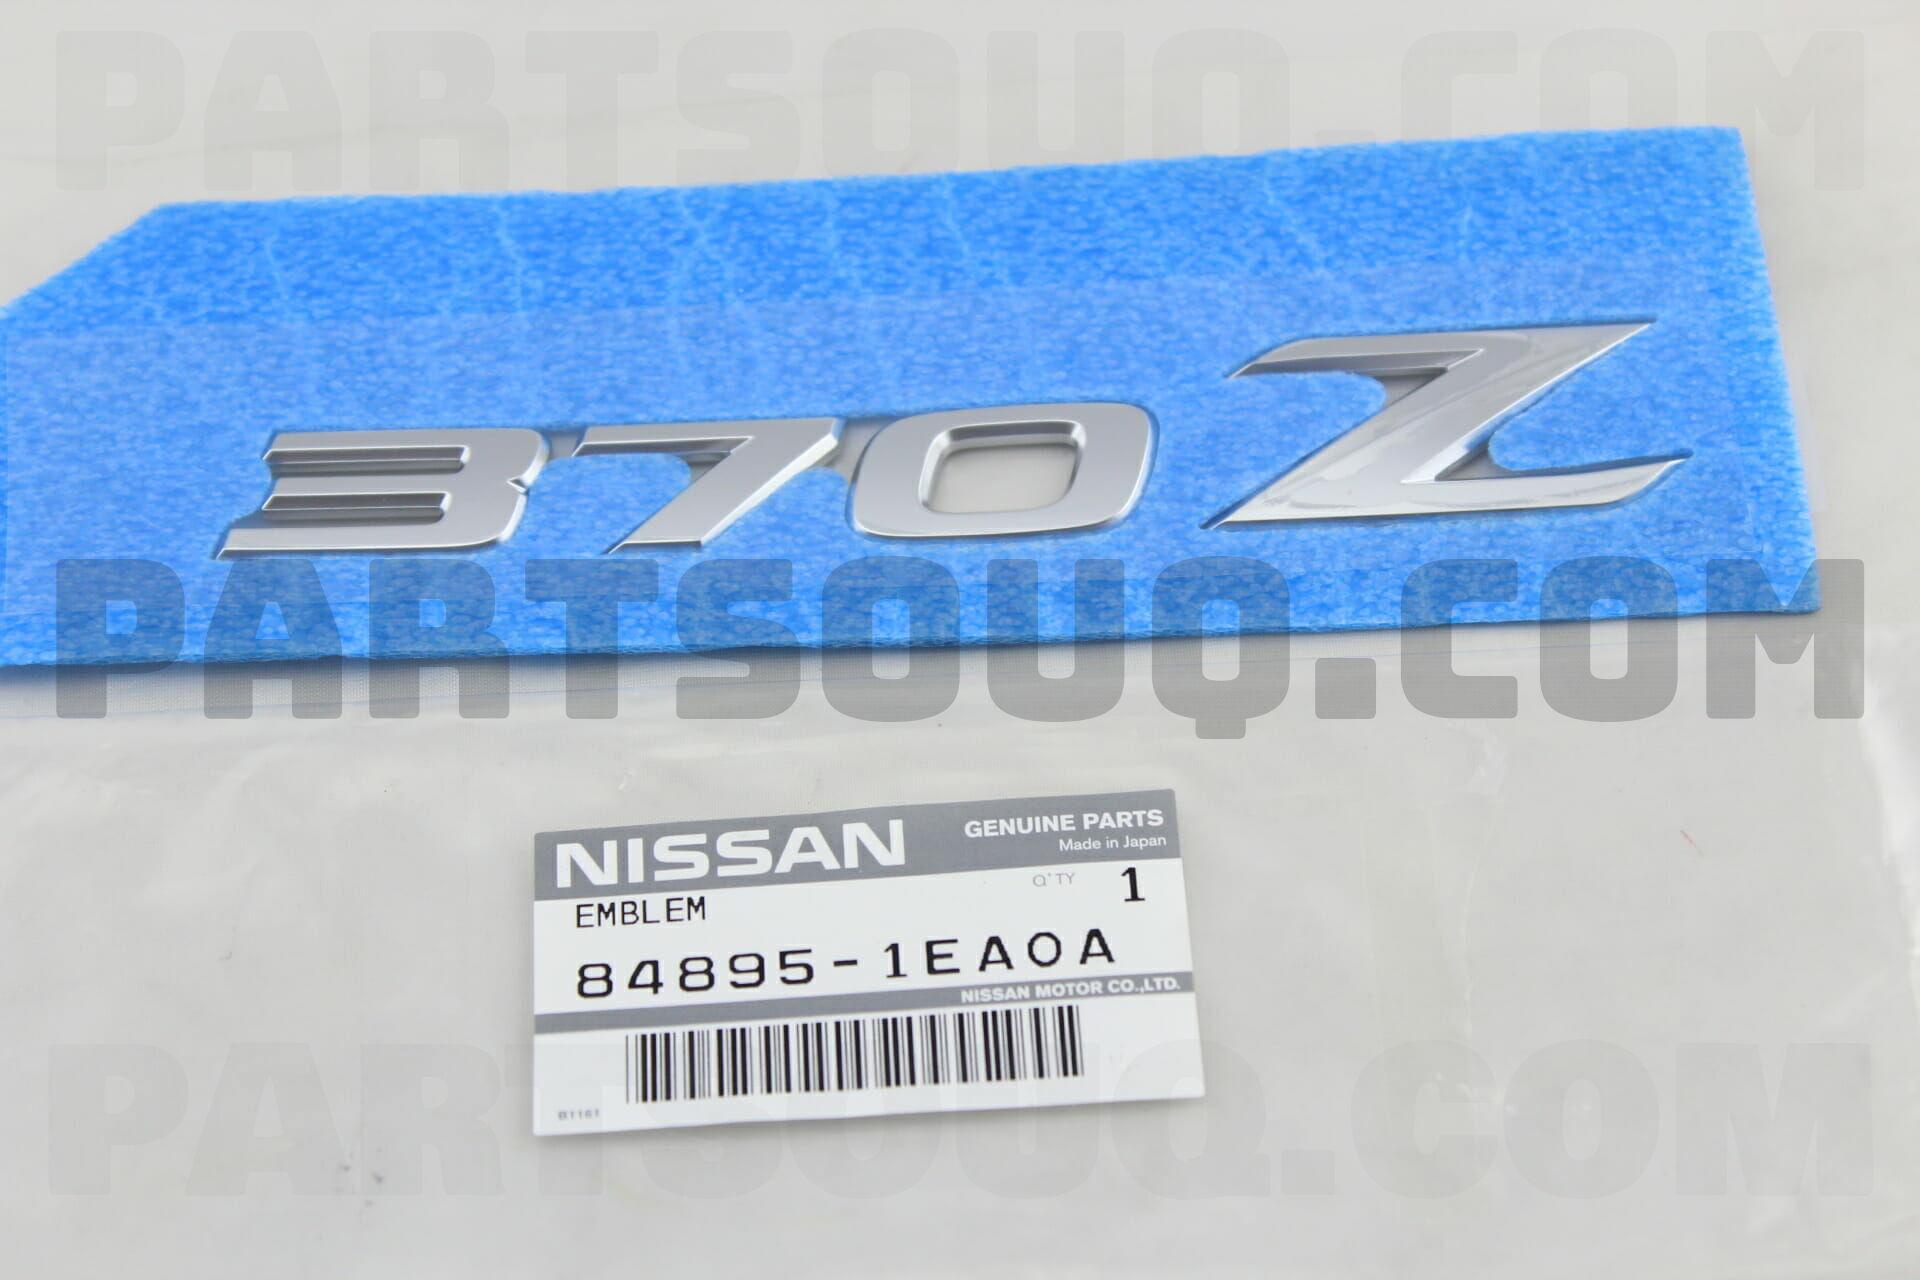 Nissan Genuine 84895-1EA0A Emblem